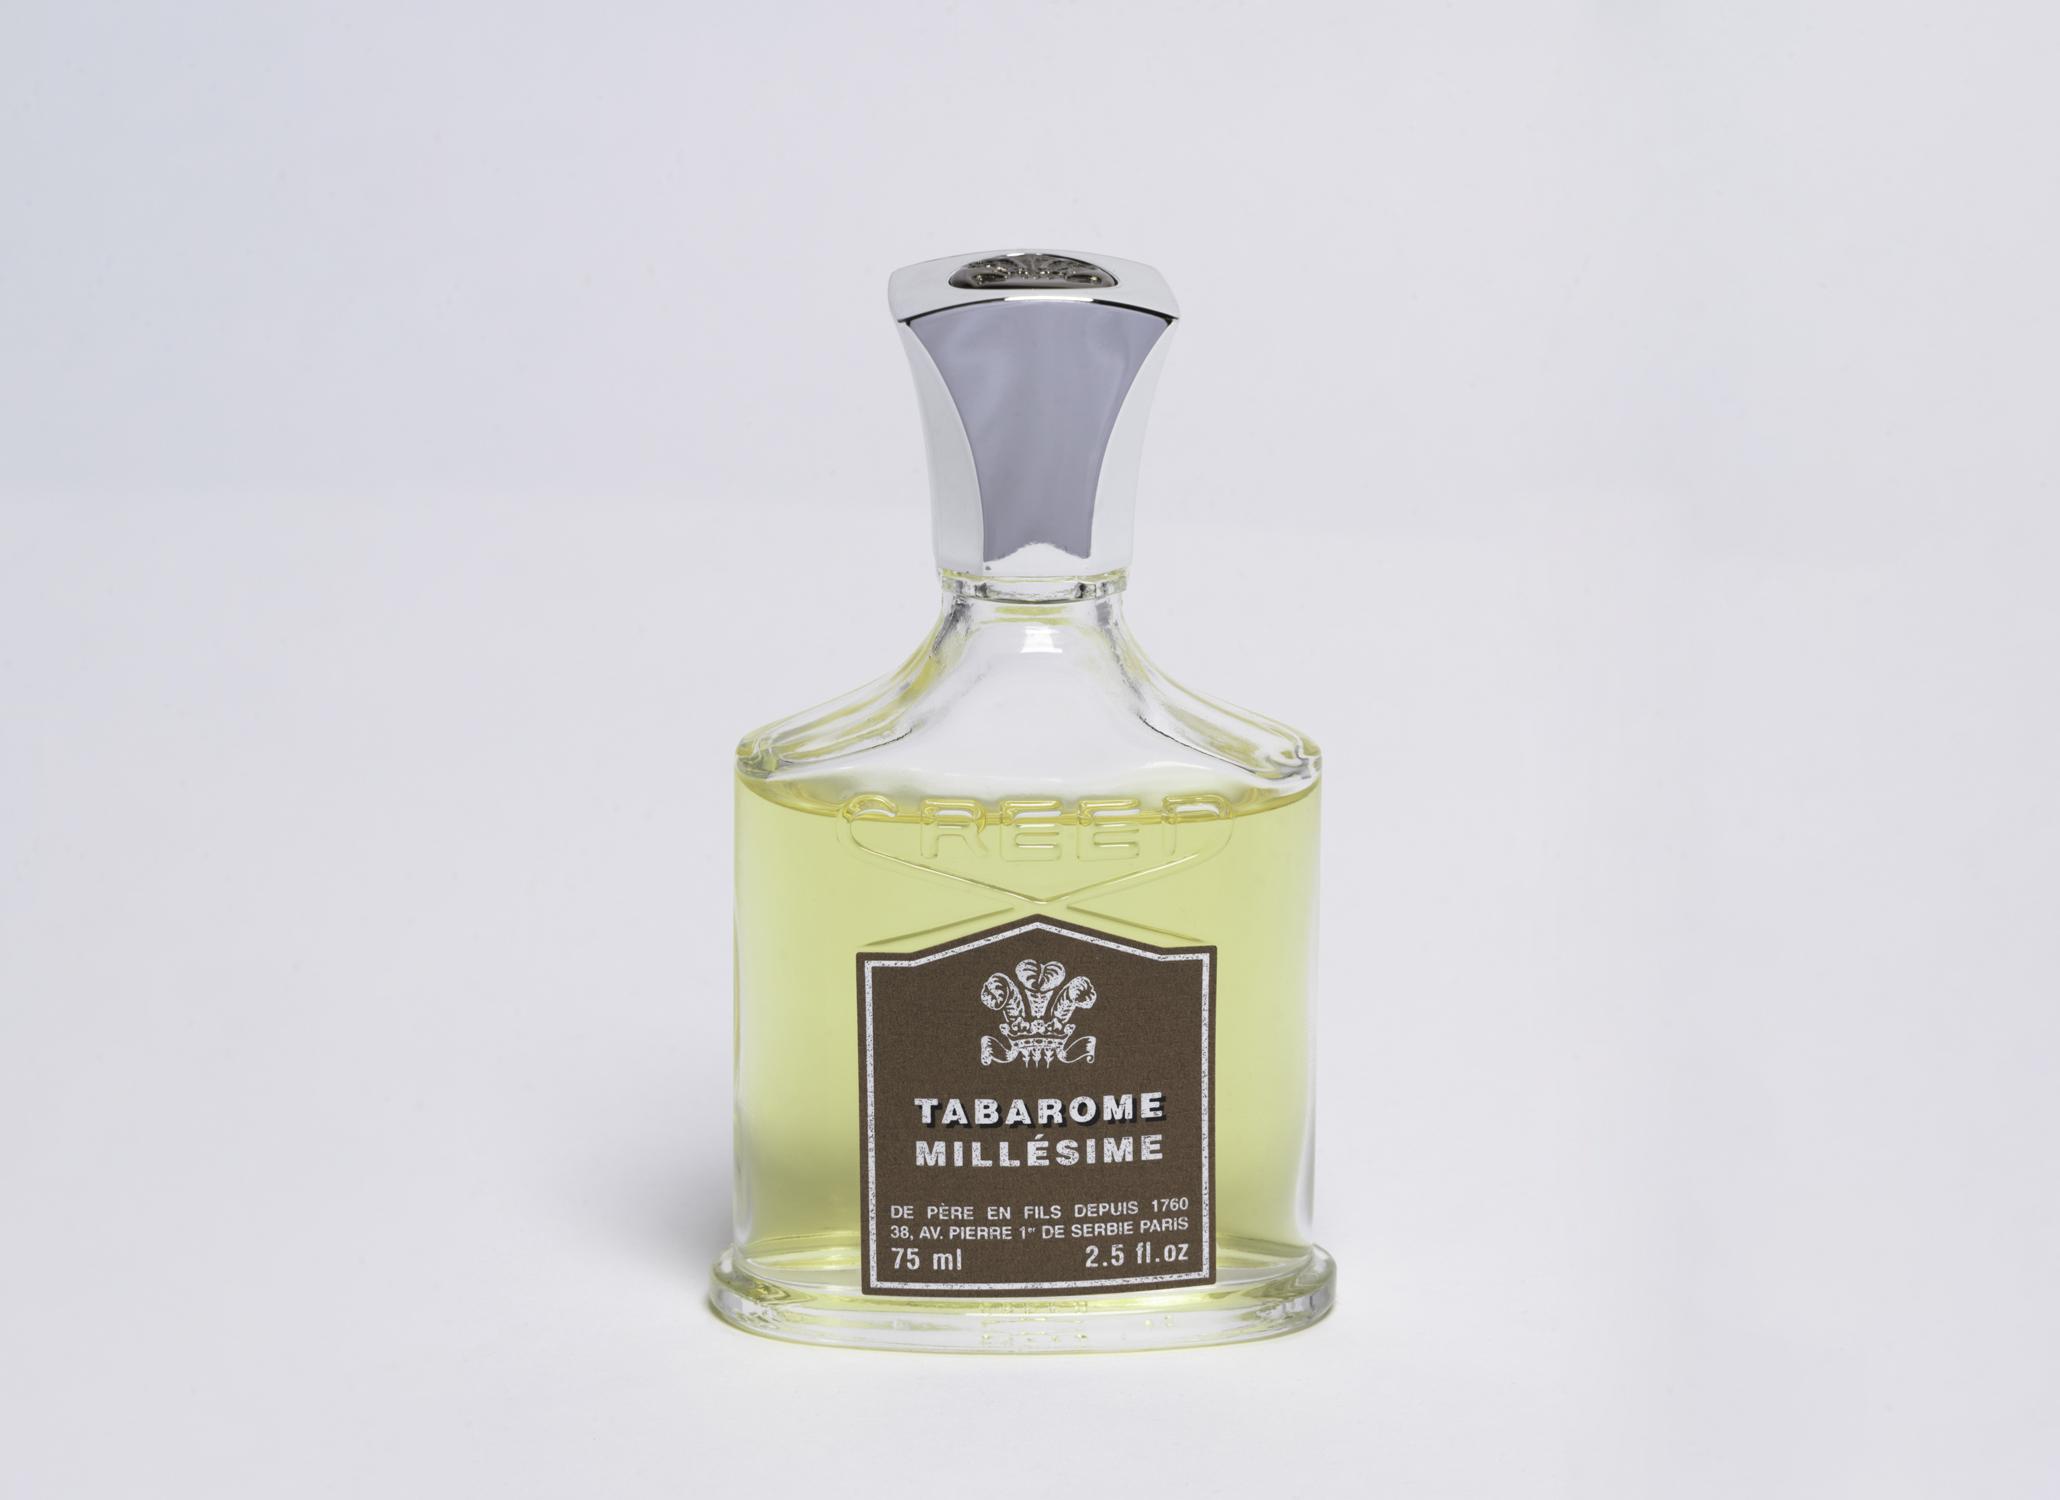 Tabarome Millesime Eau de Parfum